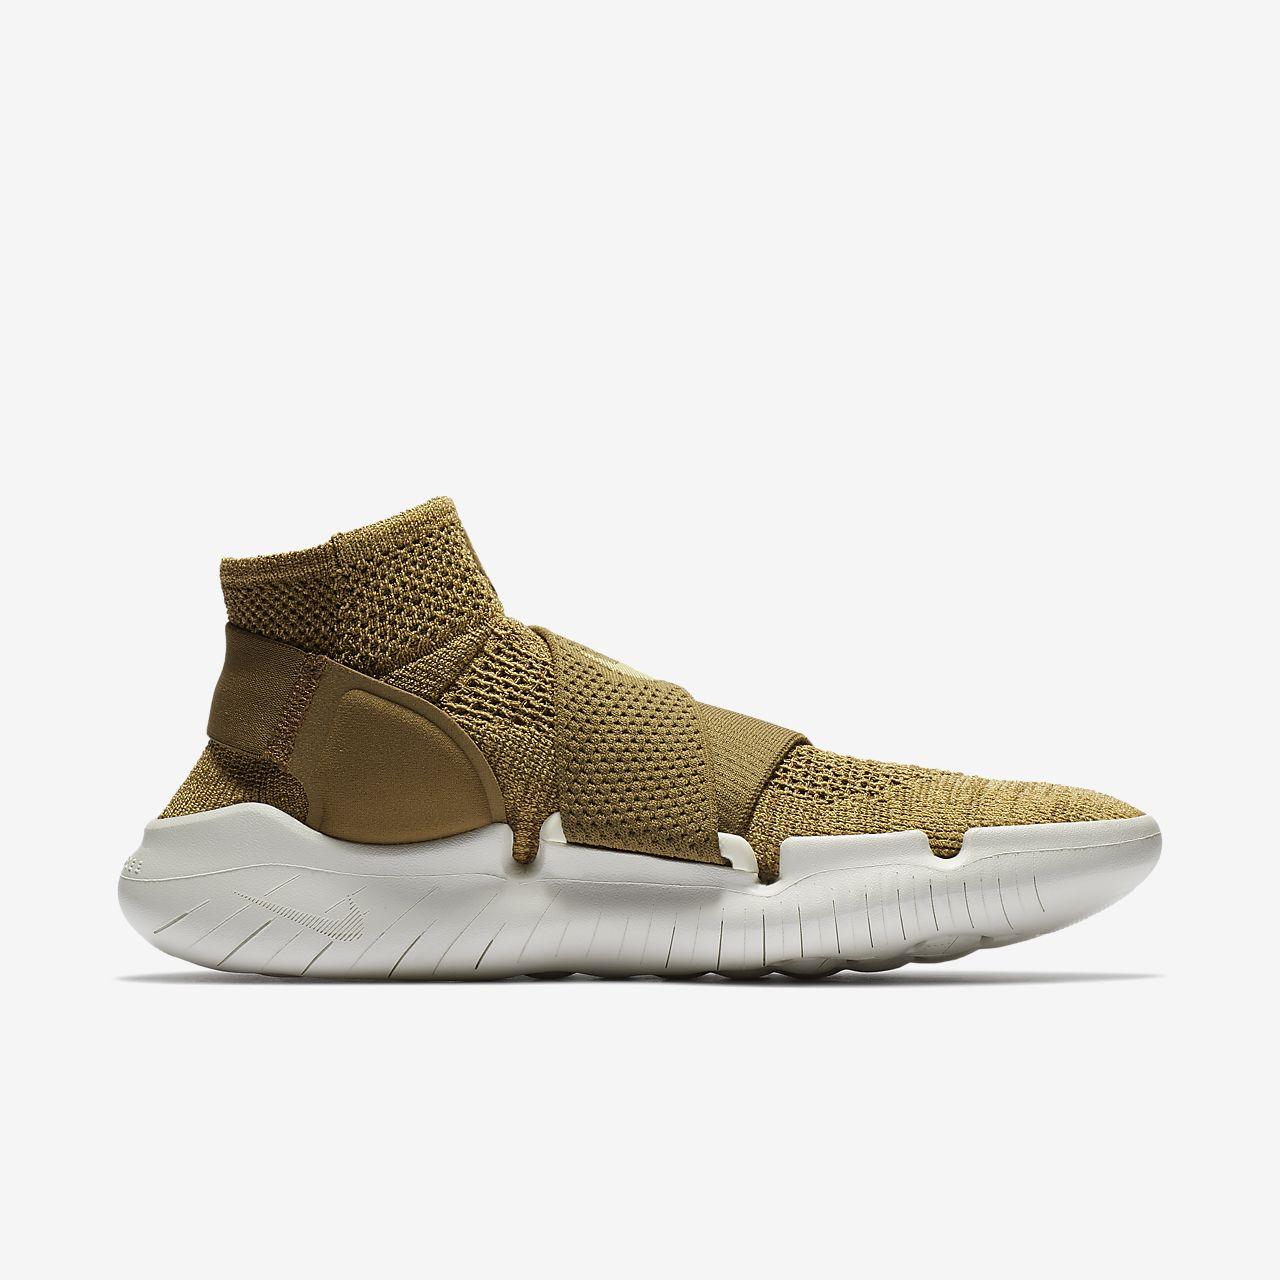 d4617c254221 Nike Free RN Motion Flyknit 2018 Men s Running Shoe. Nike.com